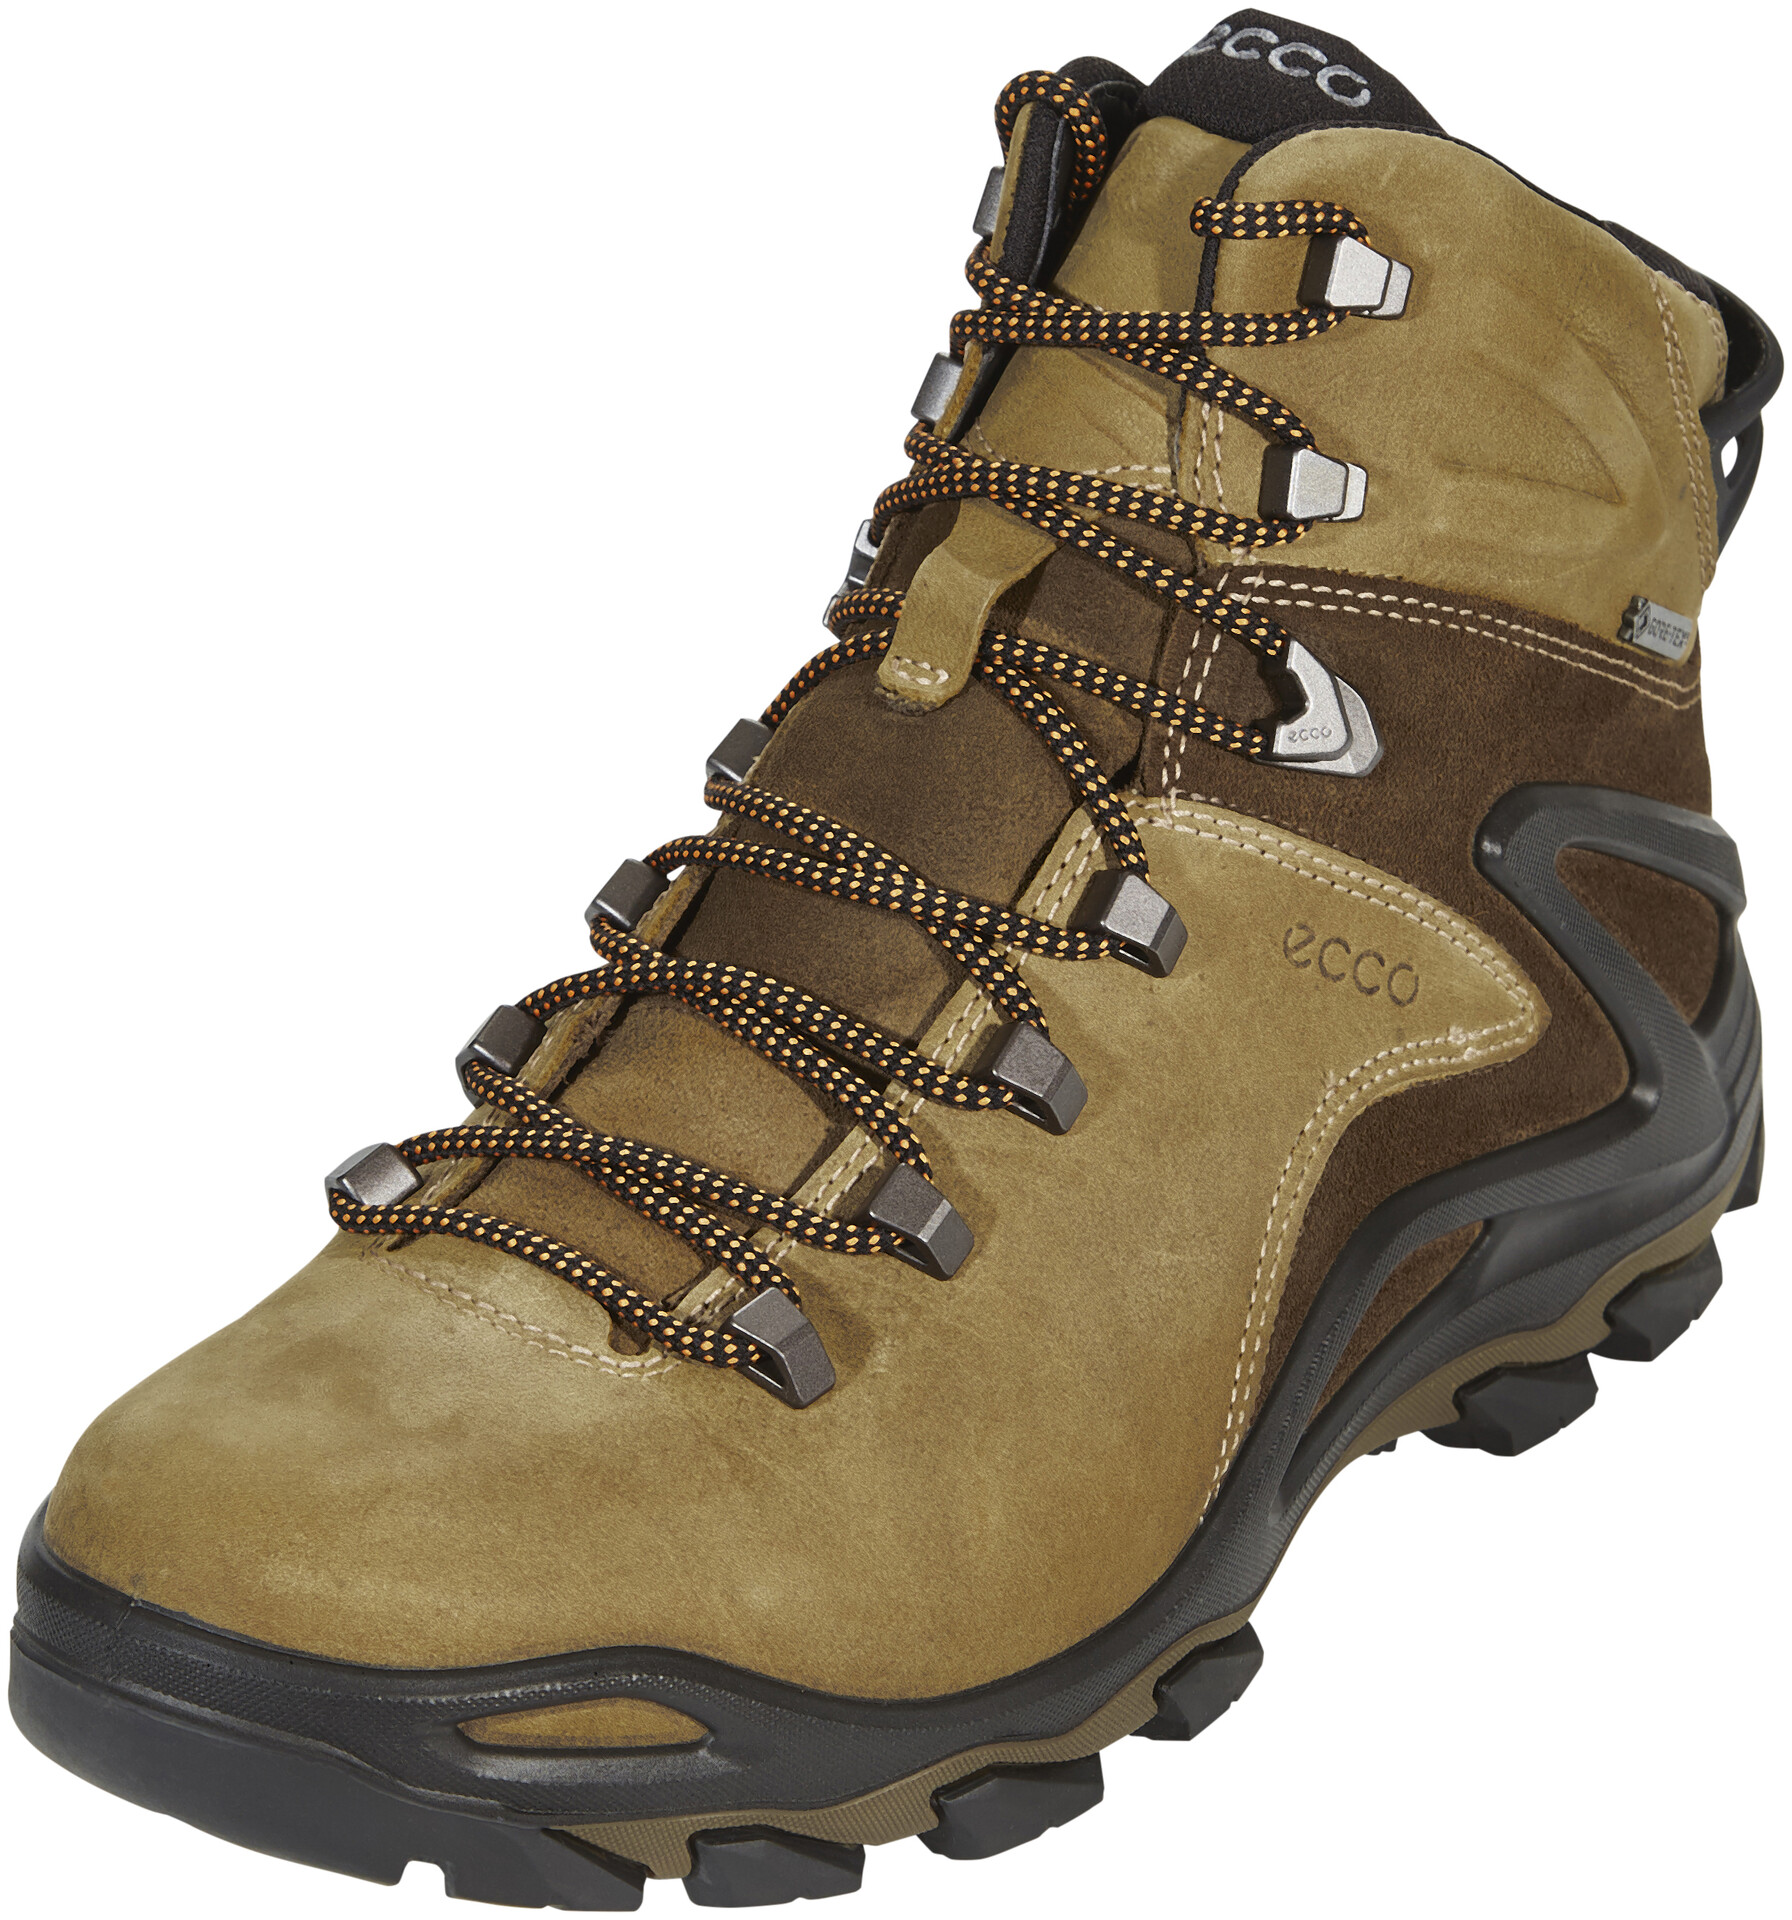 marron Terra Chaussures ECCO Mid Homme sur CAMPZ Evo 76bgyYf